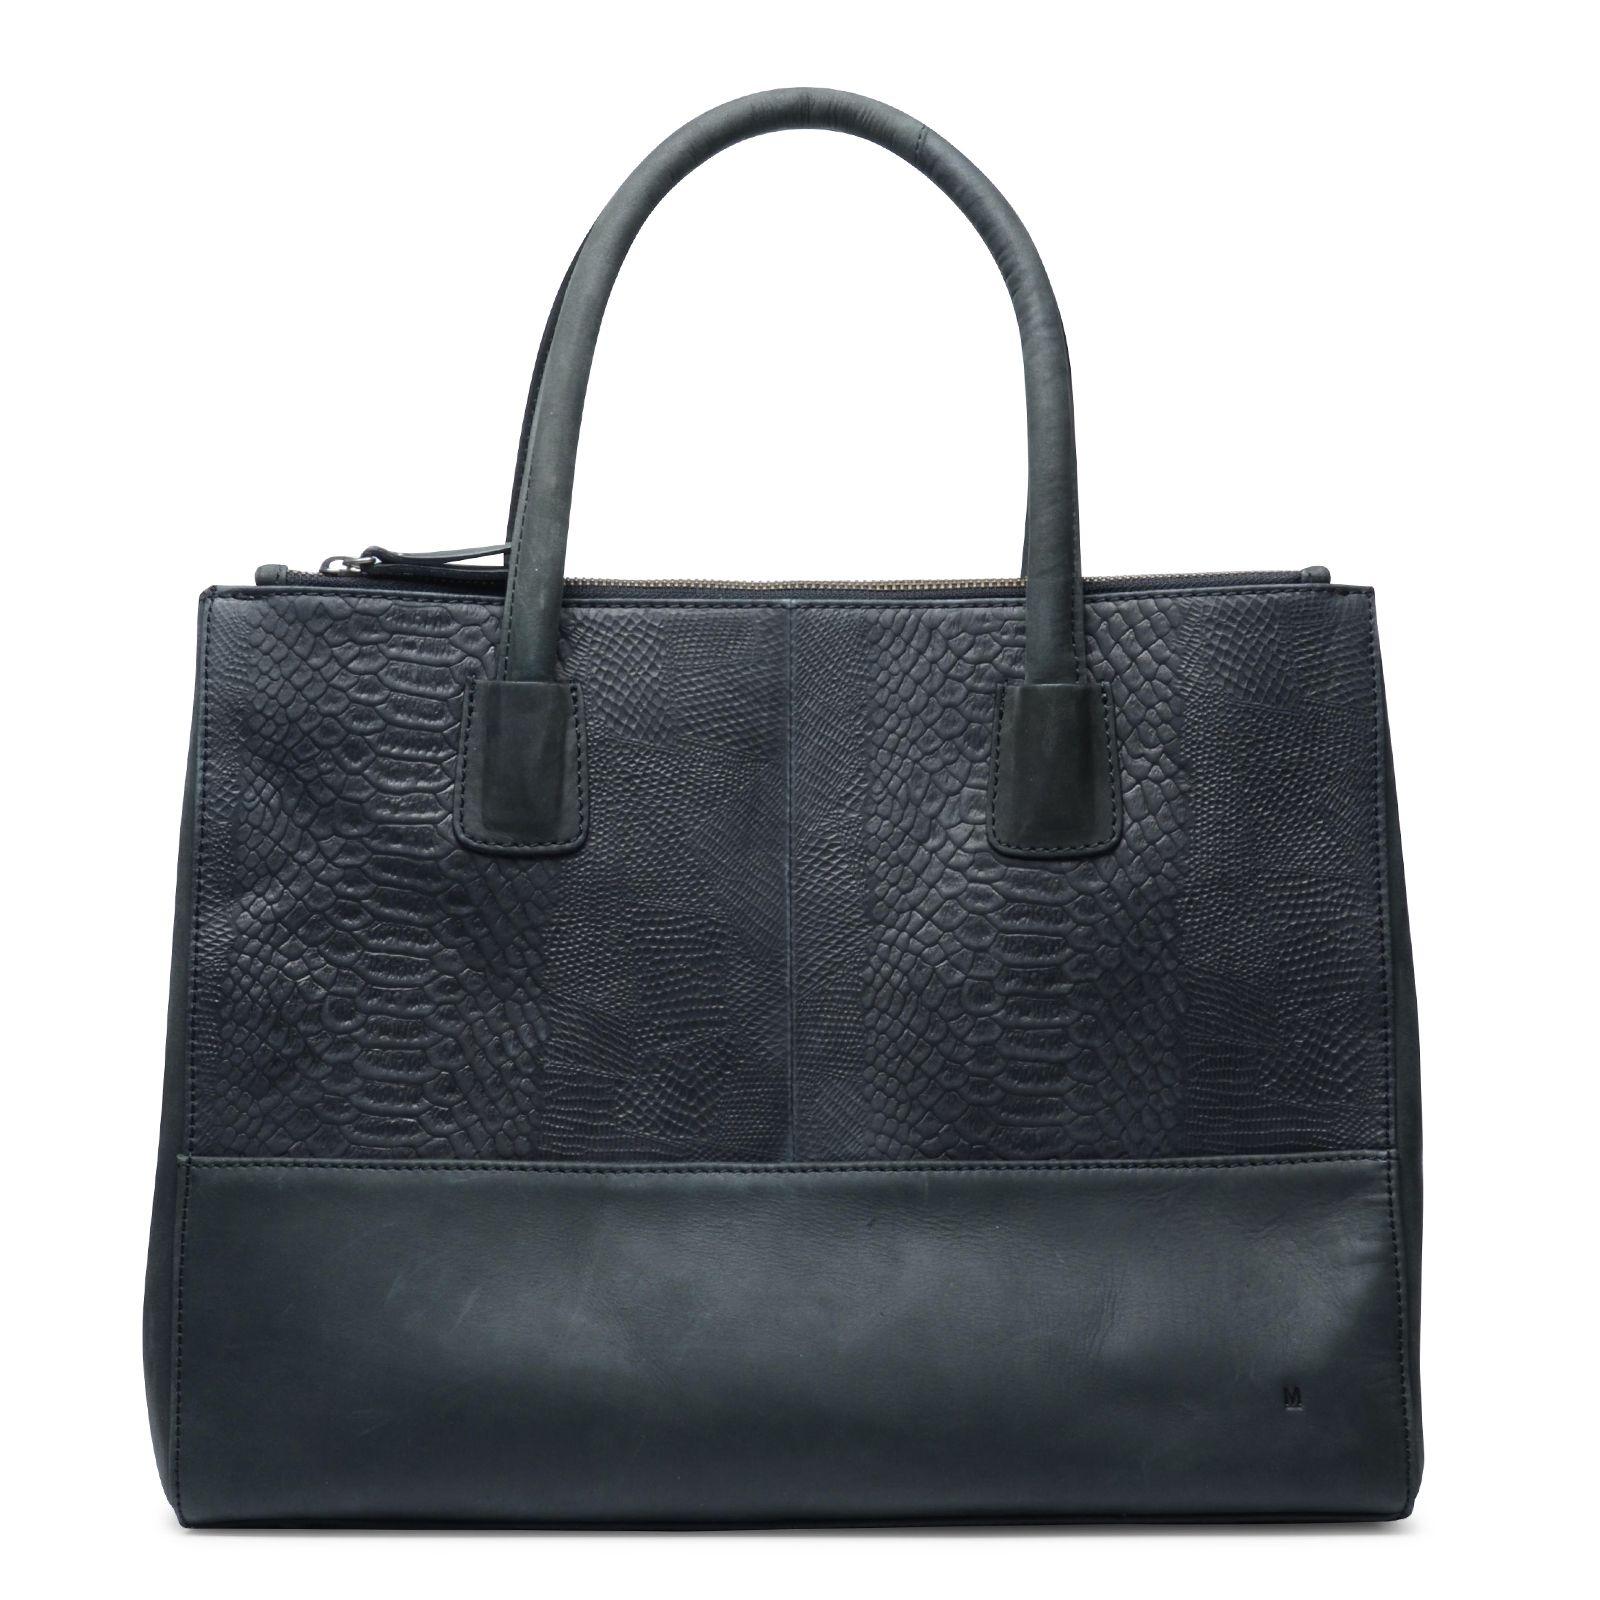 schwarze leder handtasche mit schlangenmuster. Black Bedroom Furniture Sets. Home Design Ideas